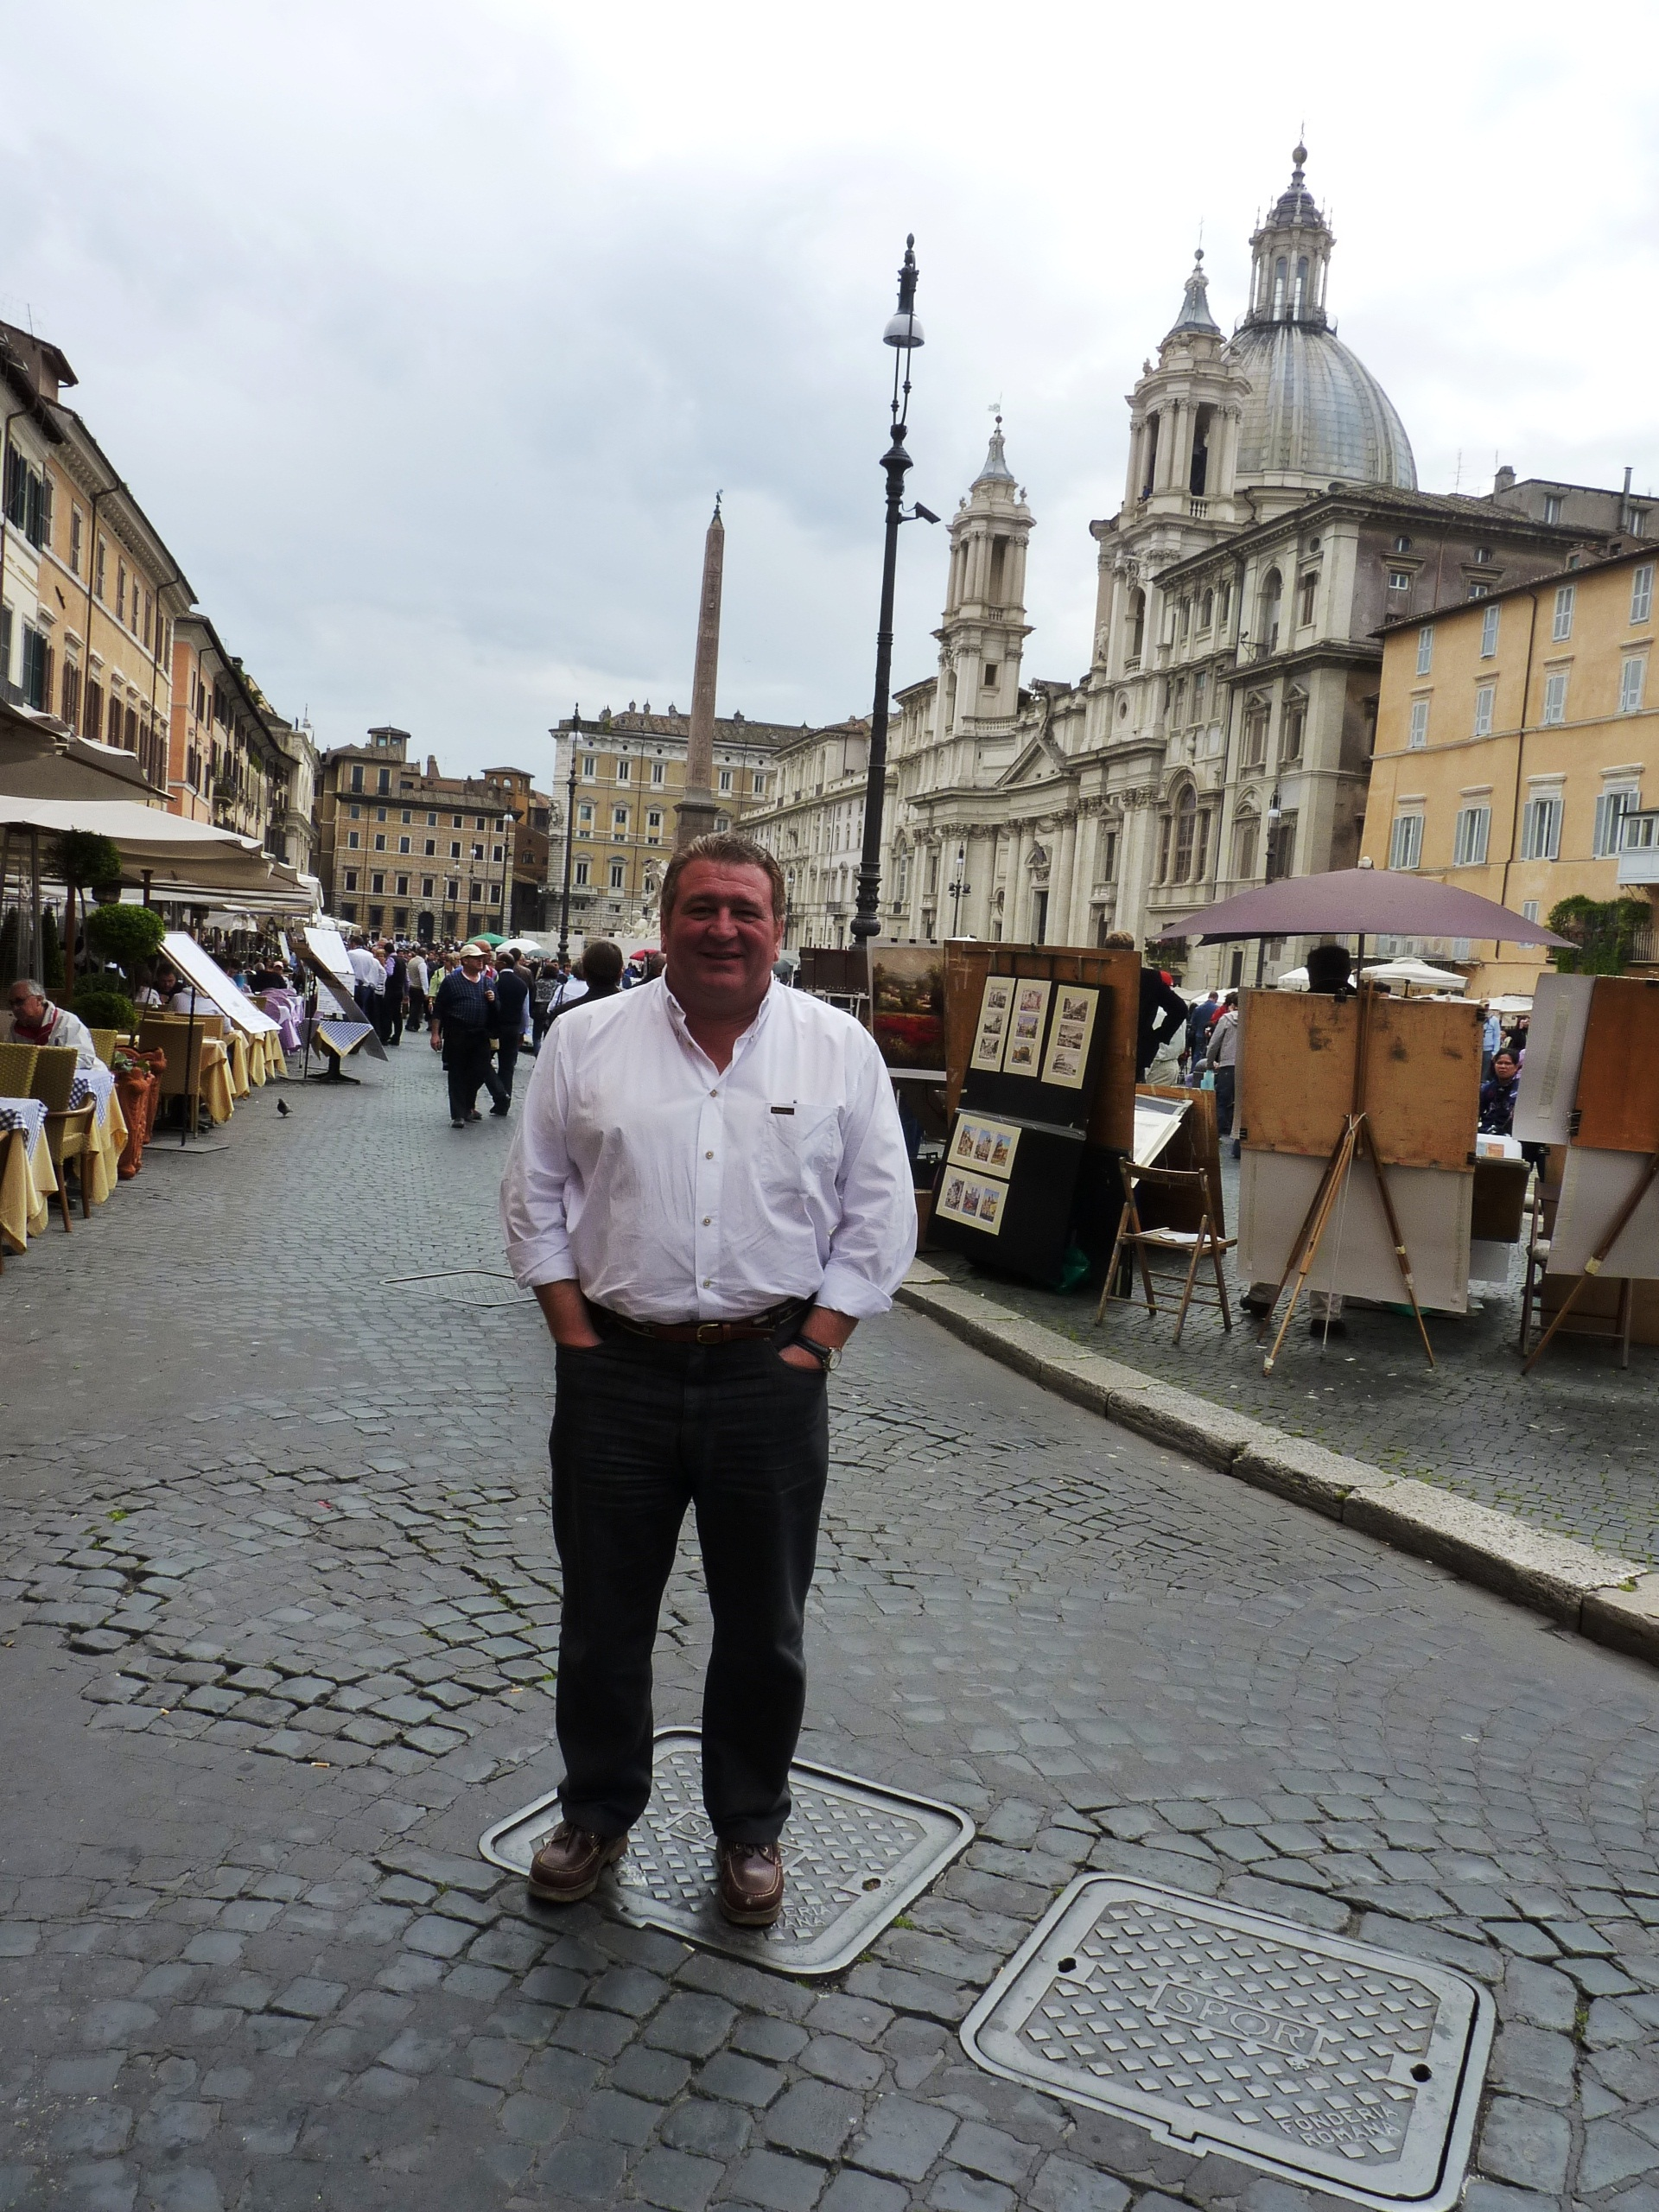 En Piazza Navona, Italia.